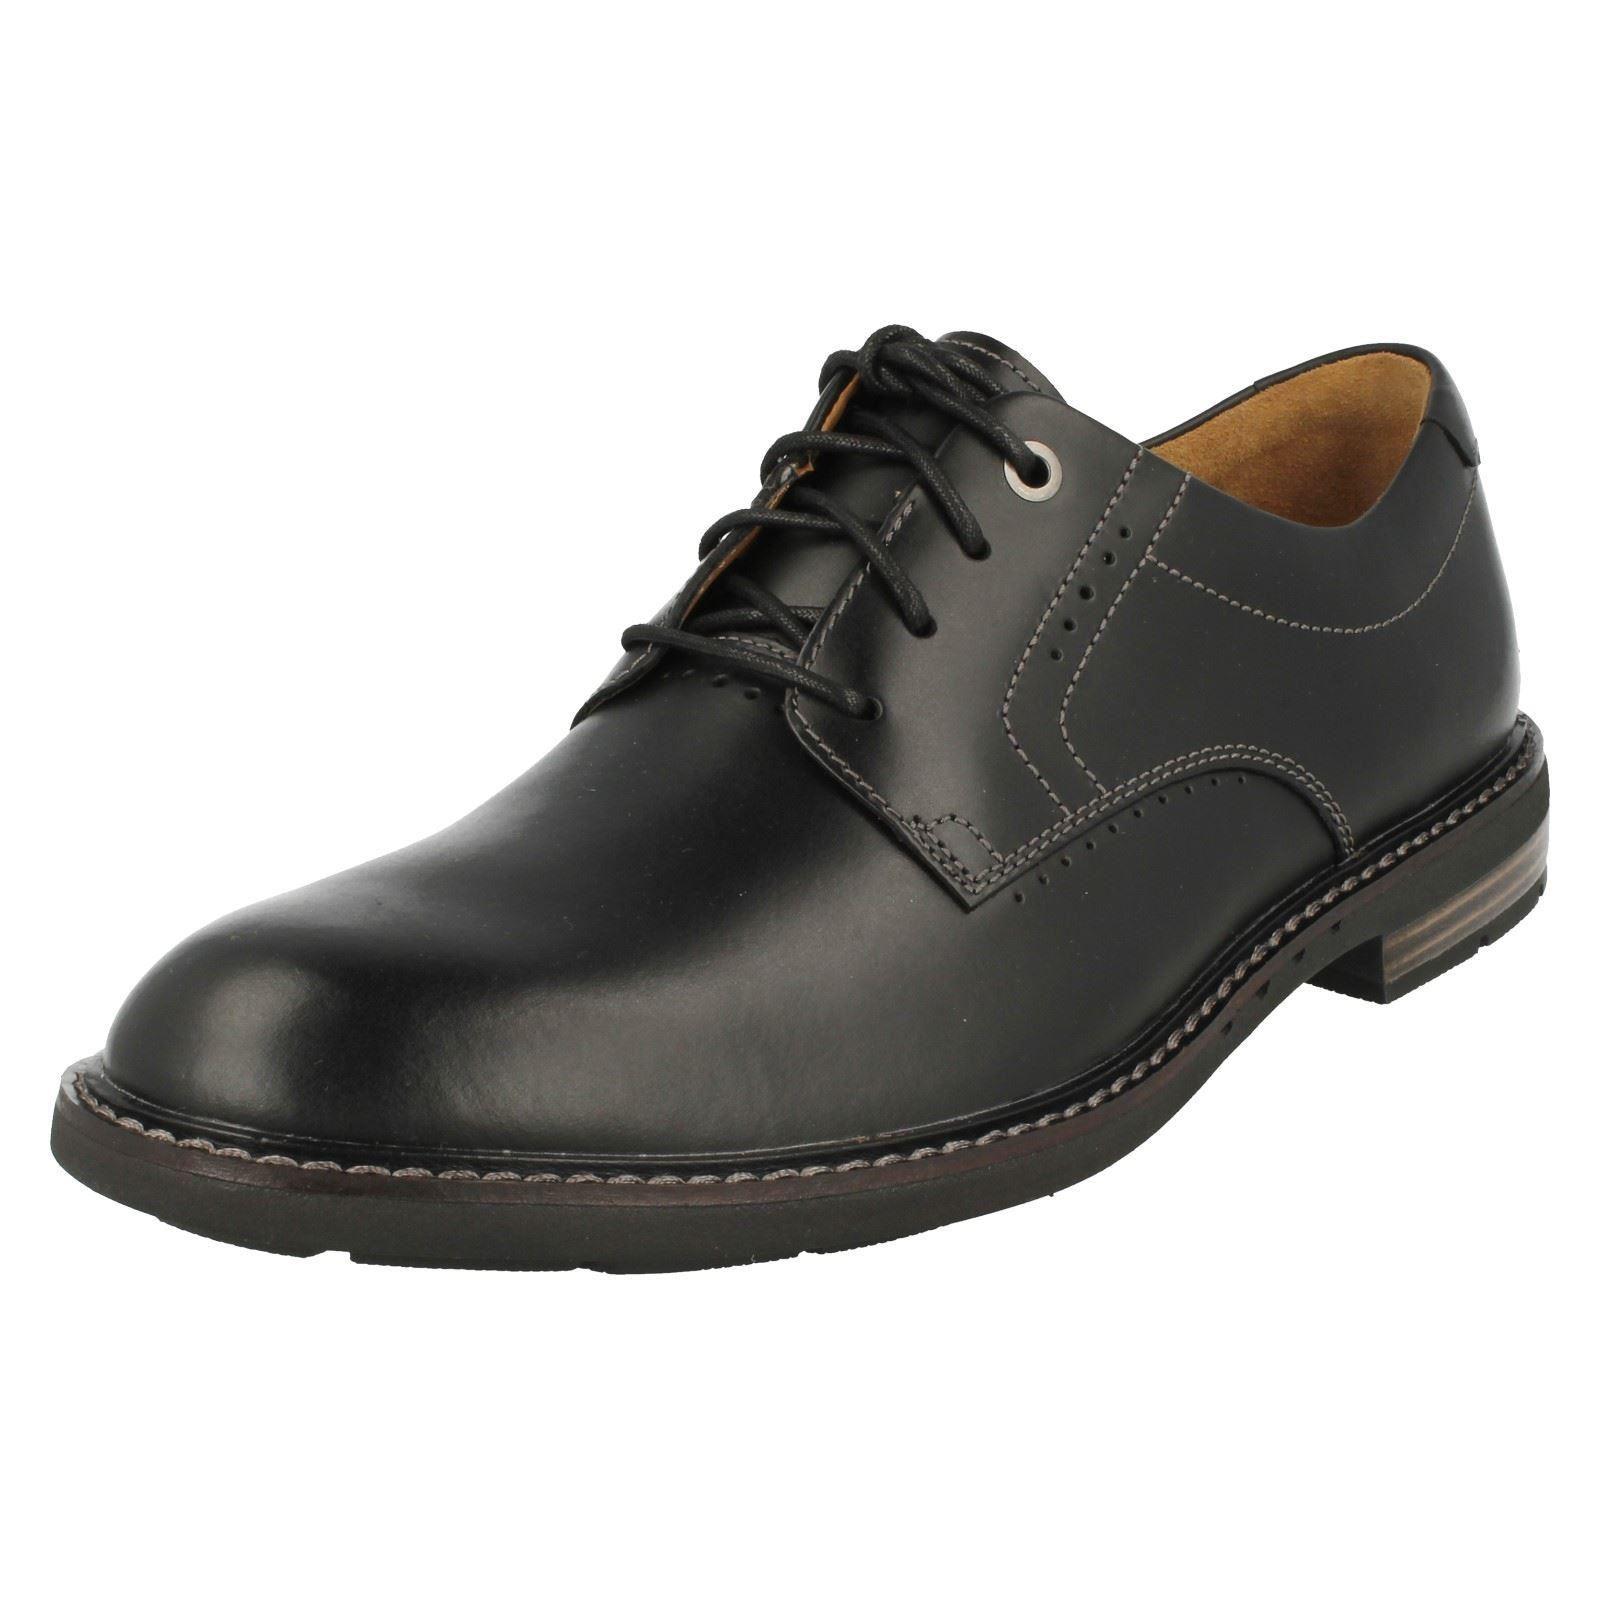 Clarks Unstructured Shoes Ebay Uk